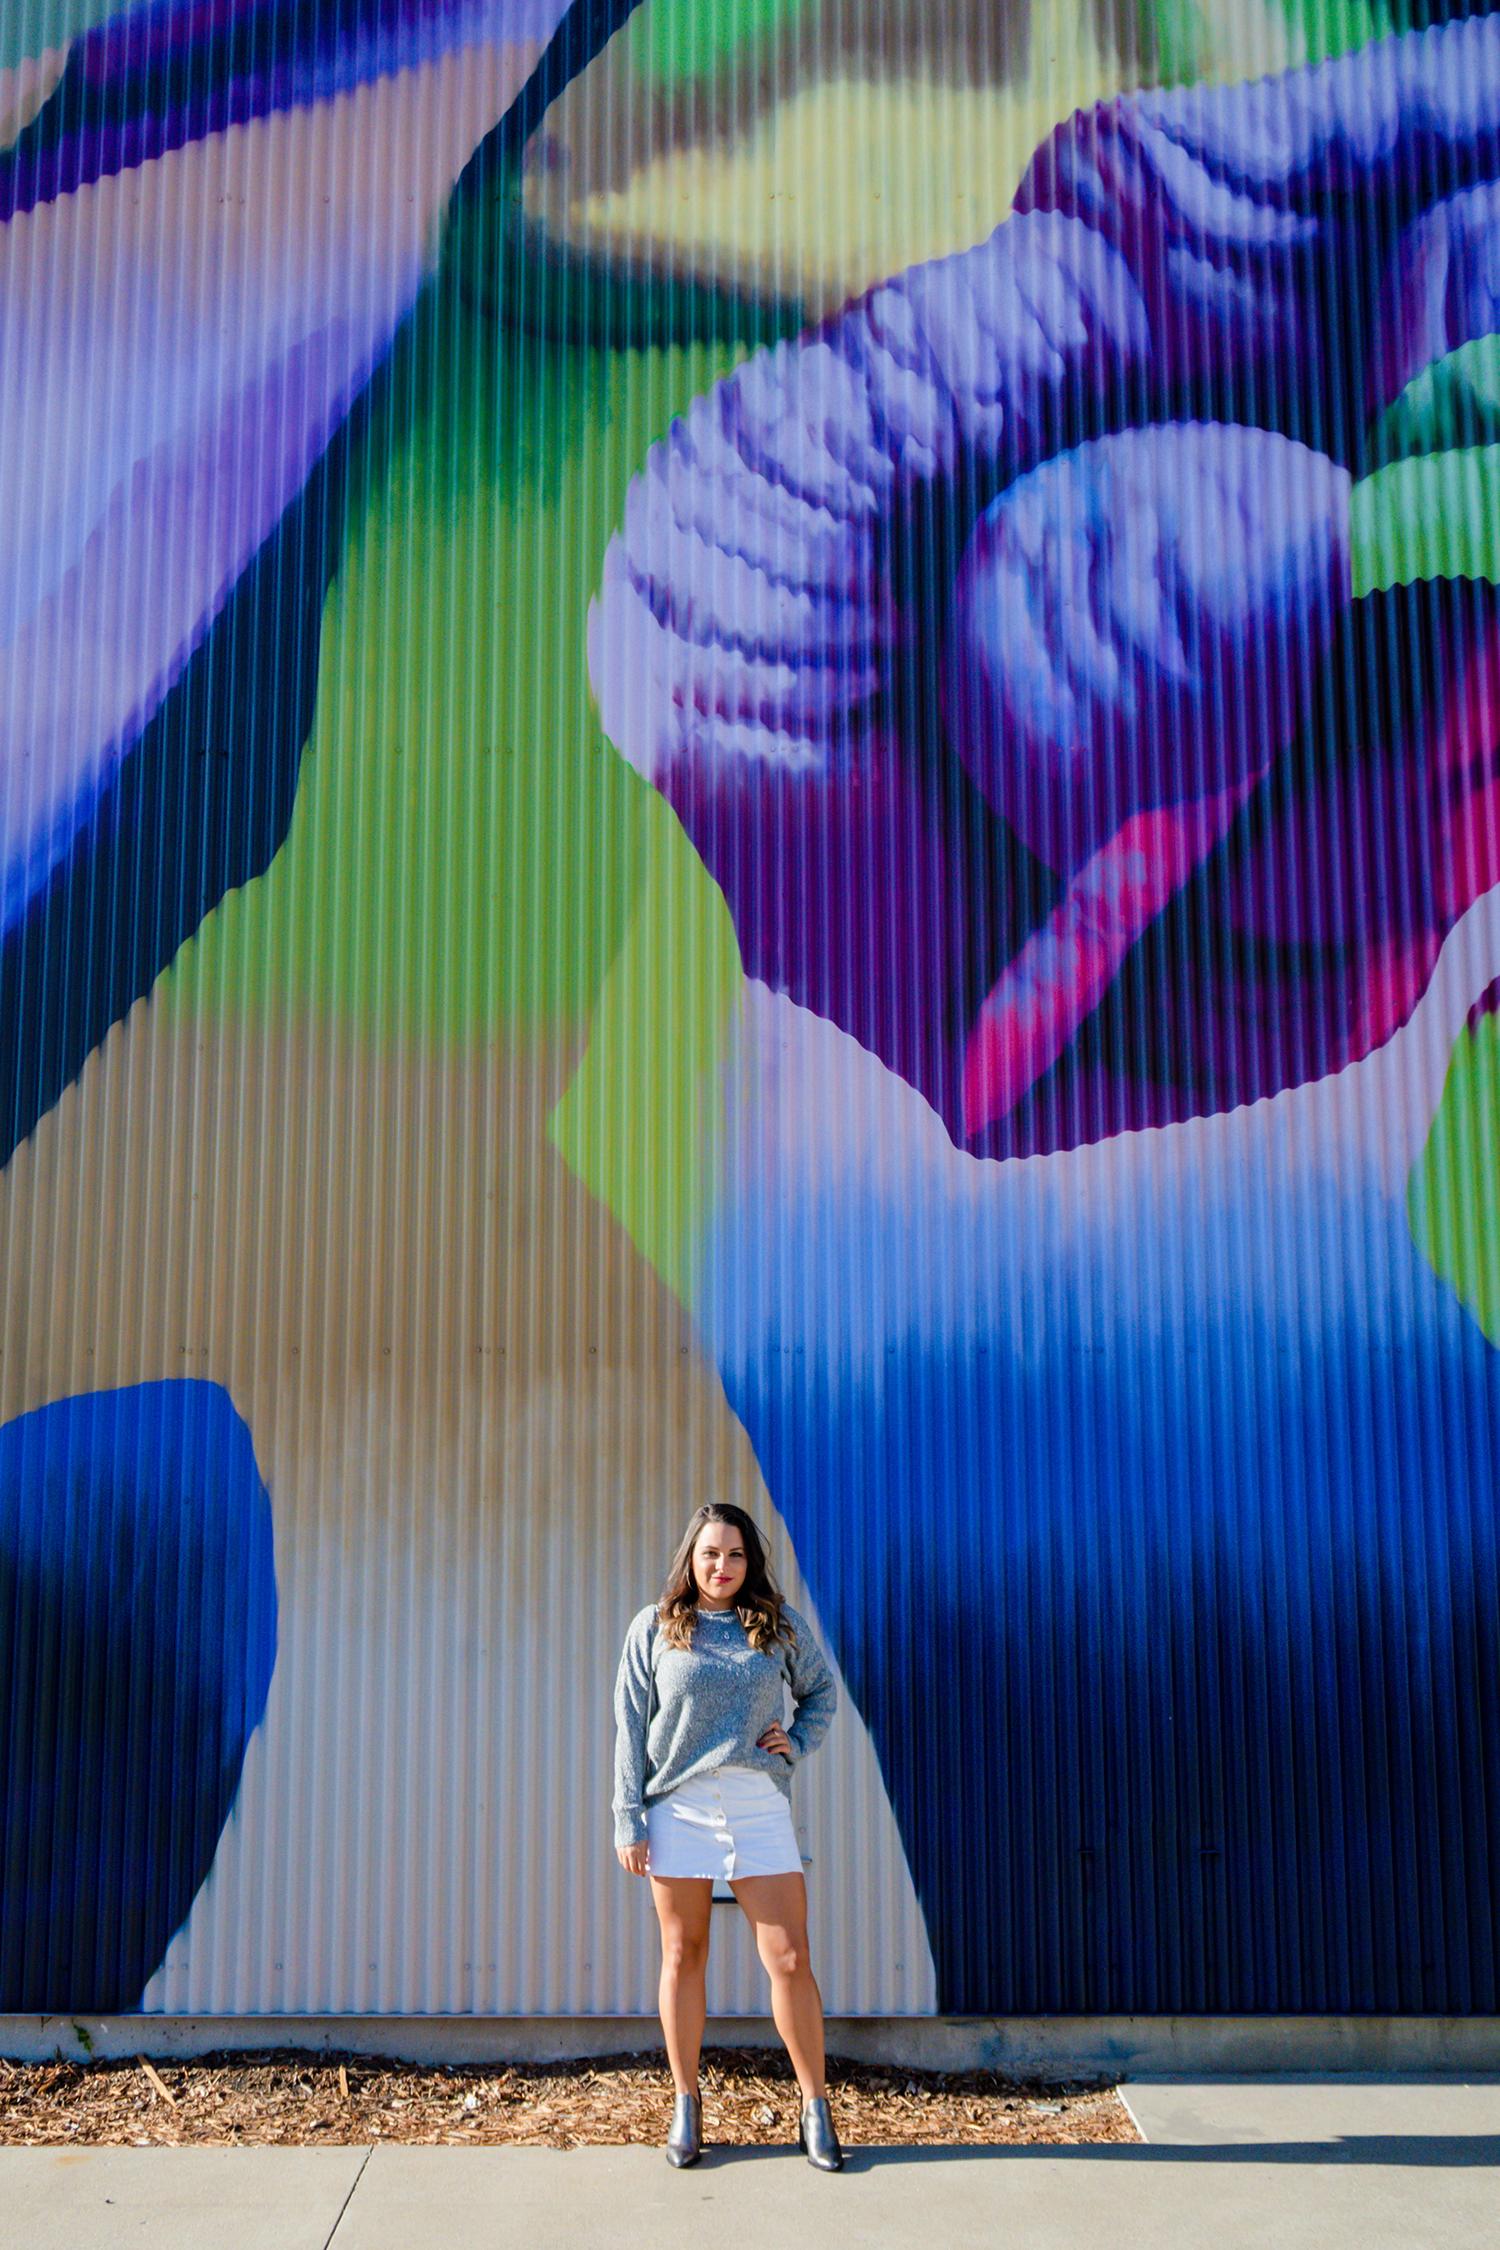 jamie harder portrait 3 jmeyering creative - J.Meyering Creative